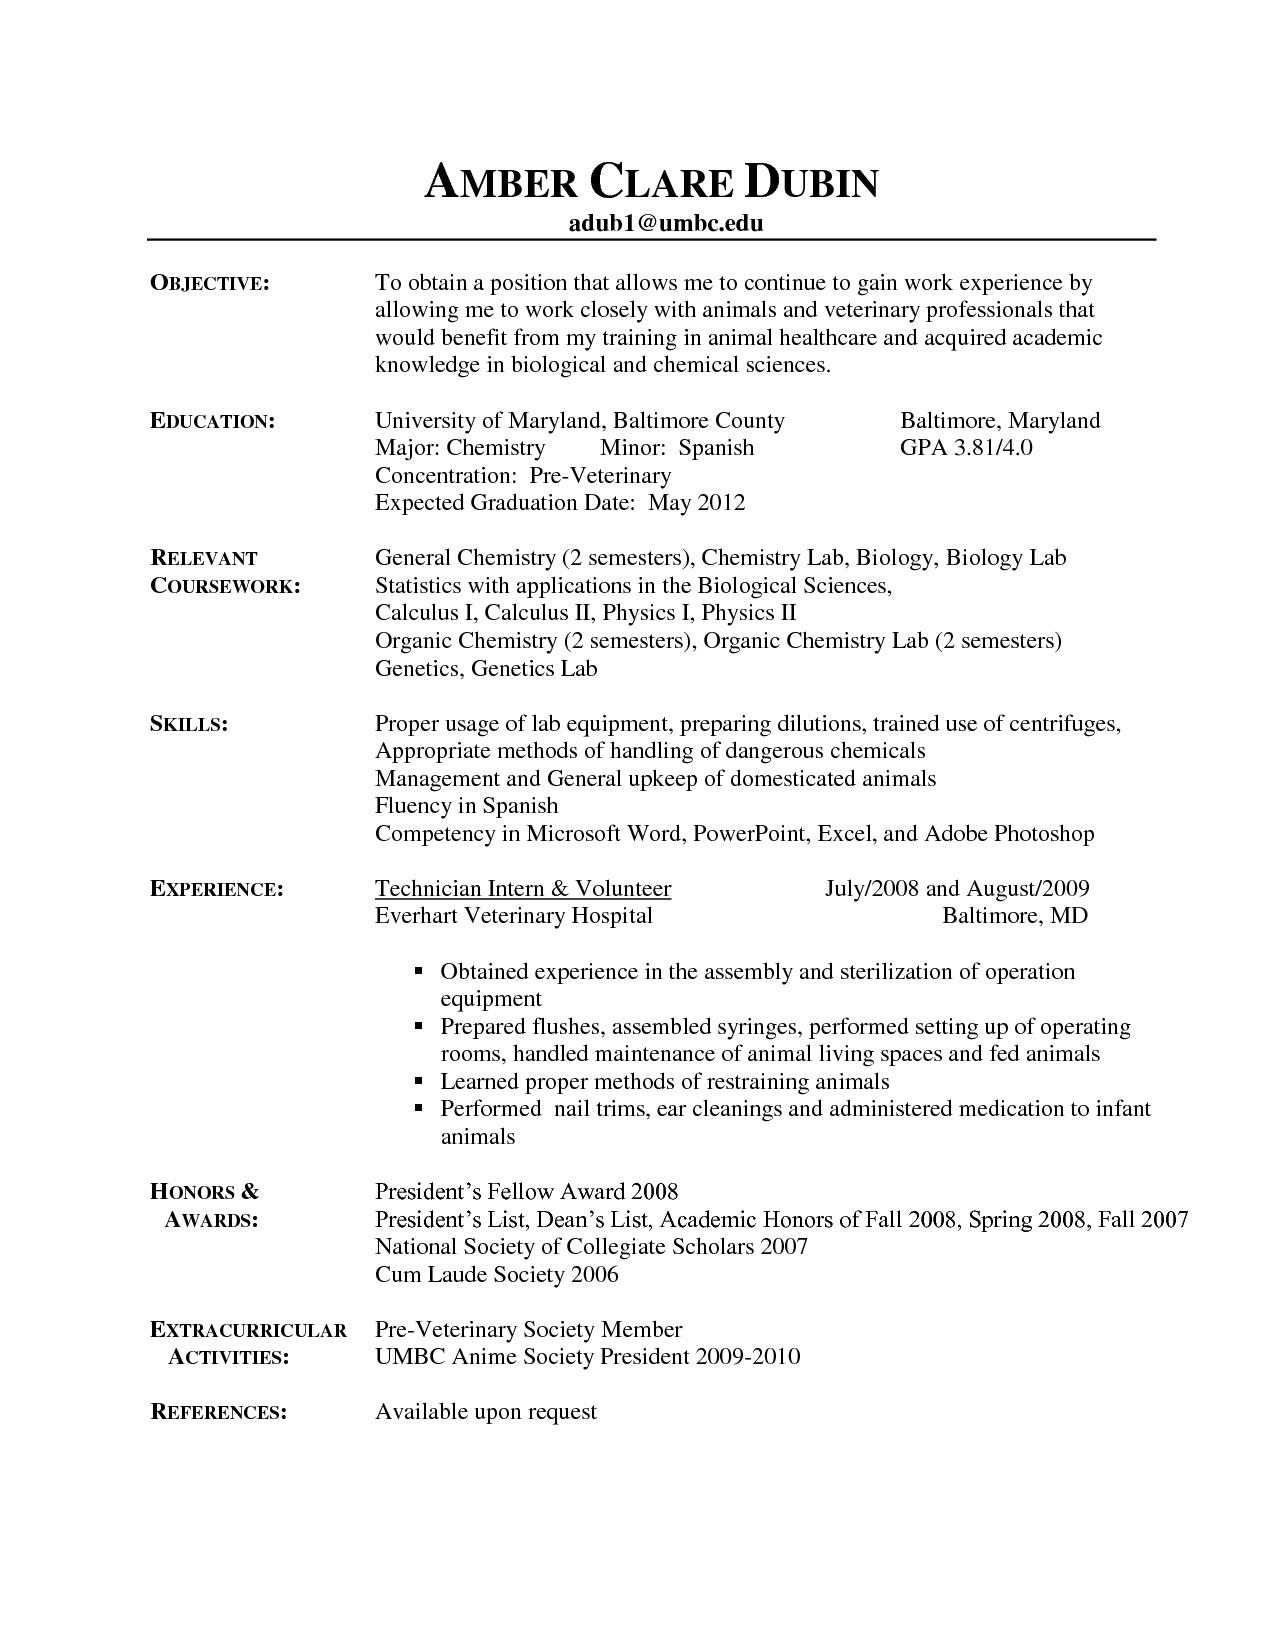 Resume Examples Veterinary Receptionist Resume Templates Veterinary Receptionist Resume Examples Good Resume Examples